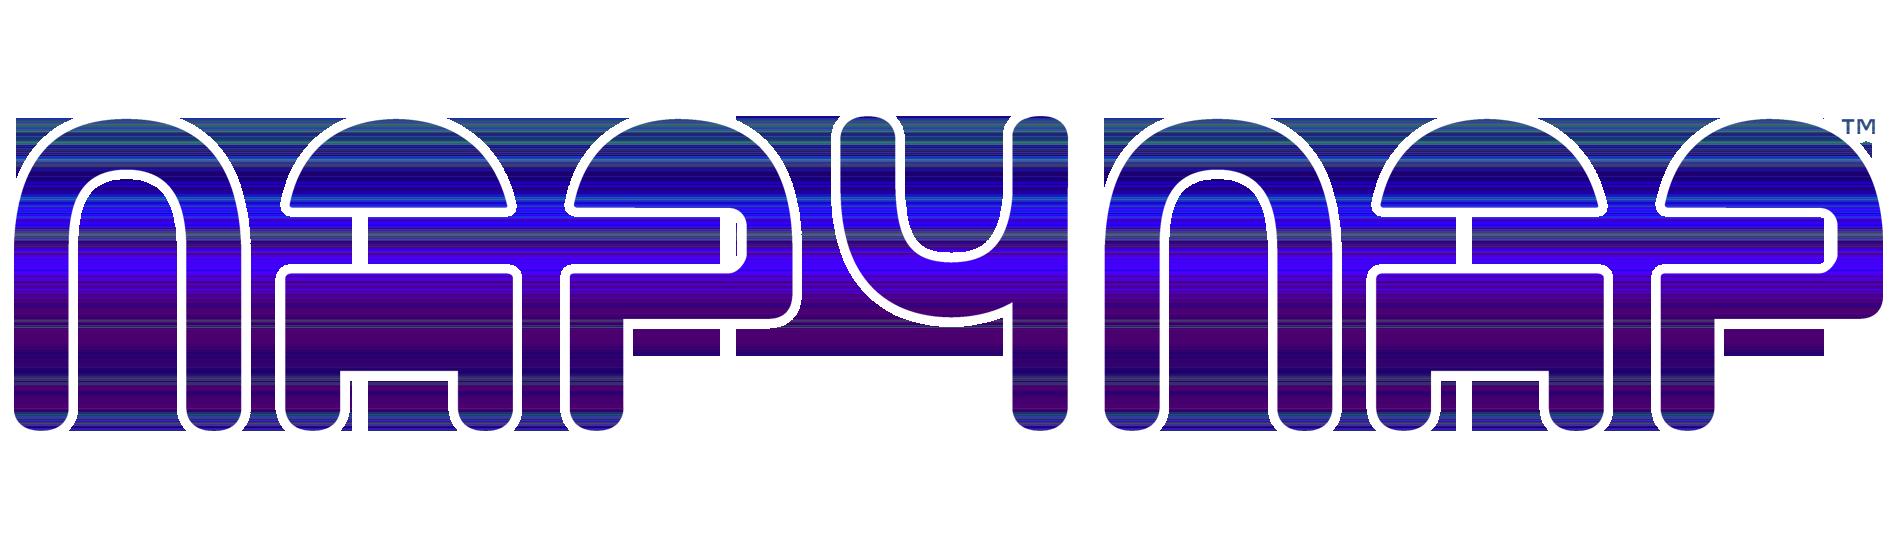 Napynap Logo